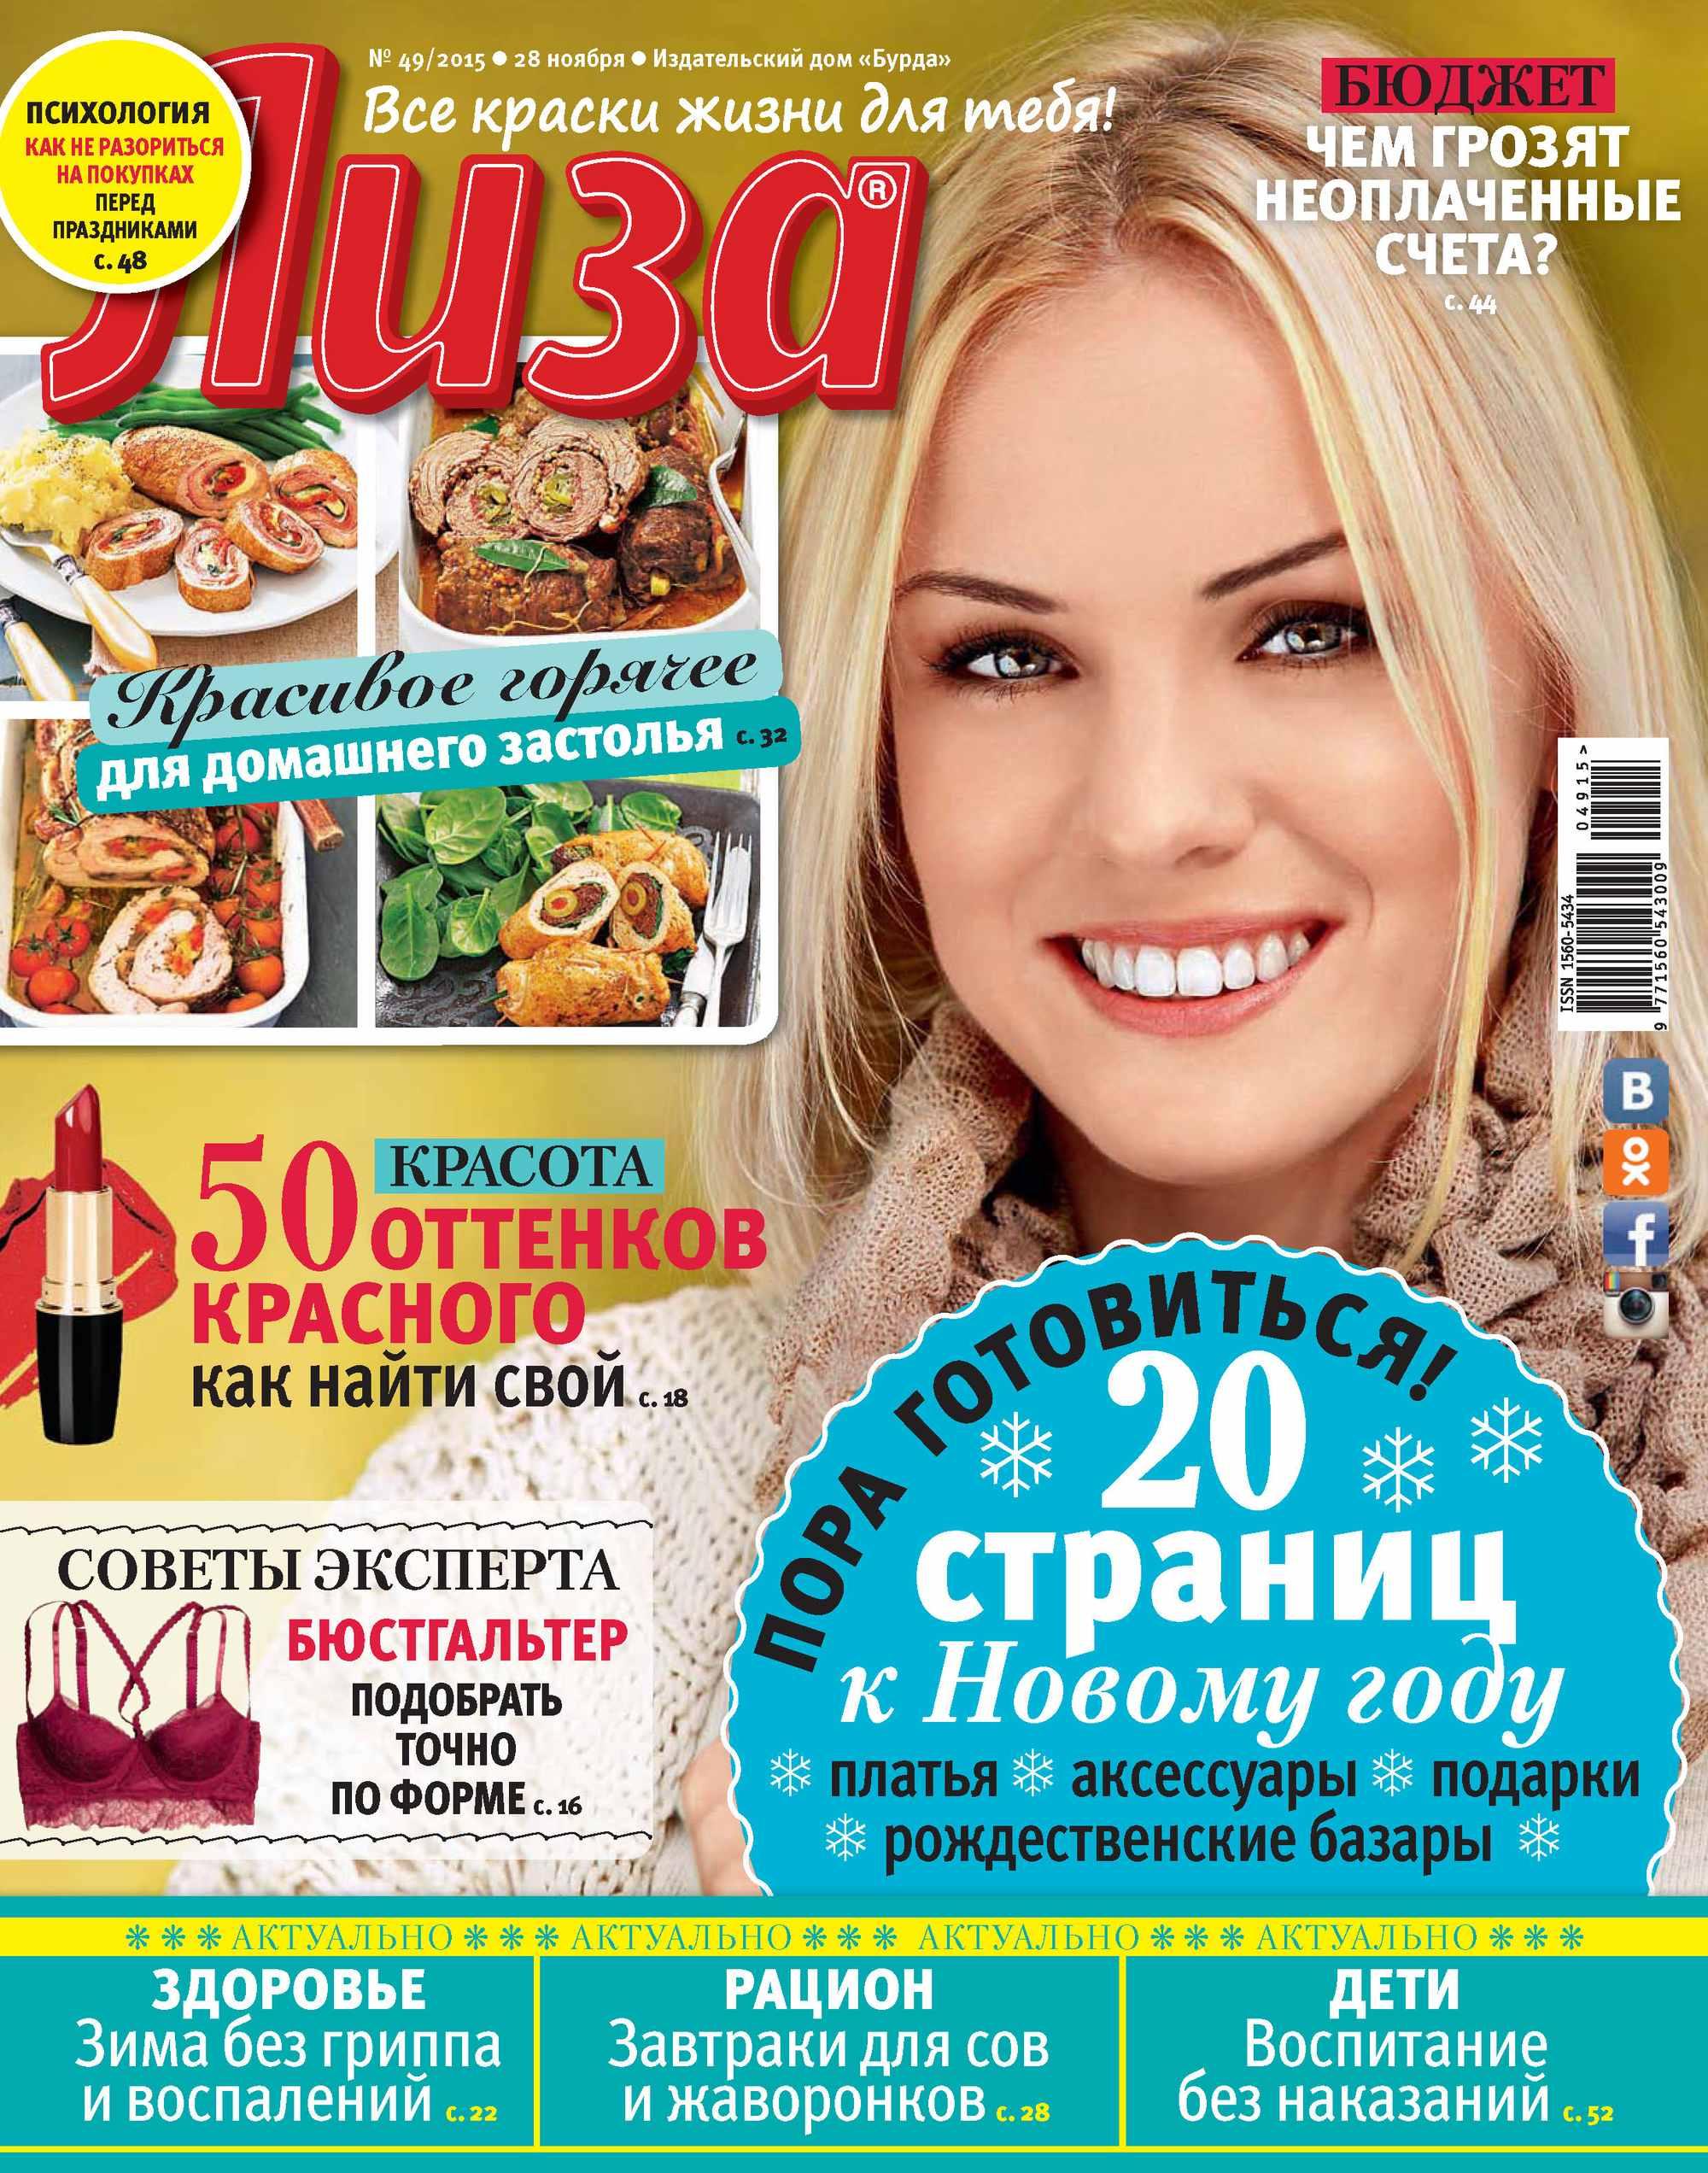 ИД «Бурда» Журнал «Лиза» №49/2015 ид бурда журнал лиза 37 2015